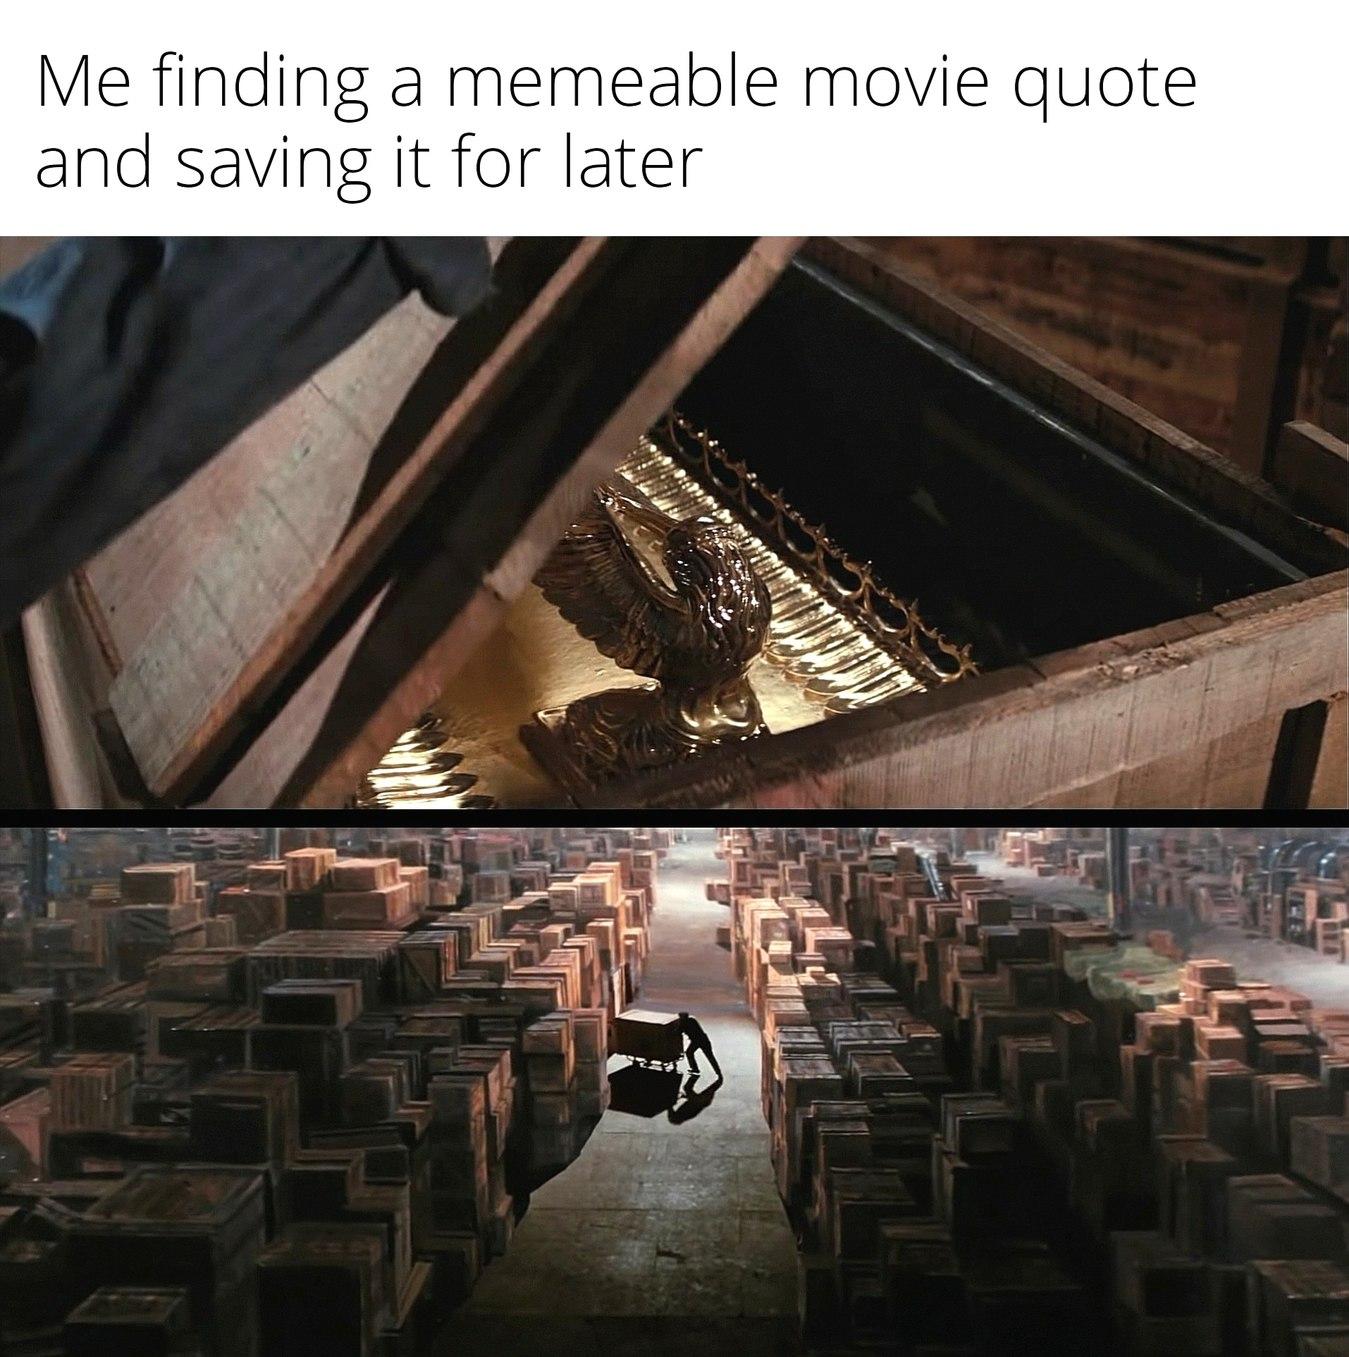 A fine addition - meme